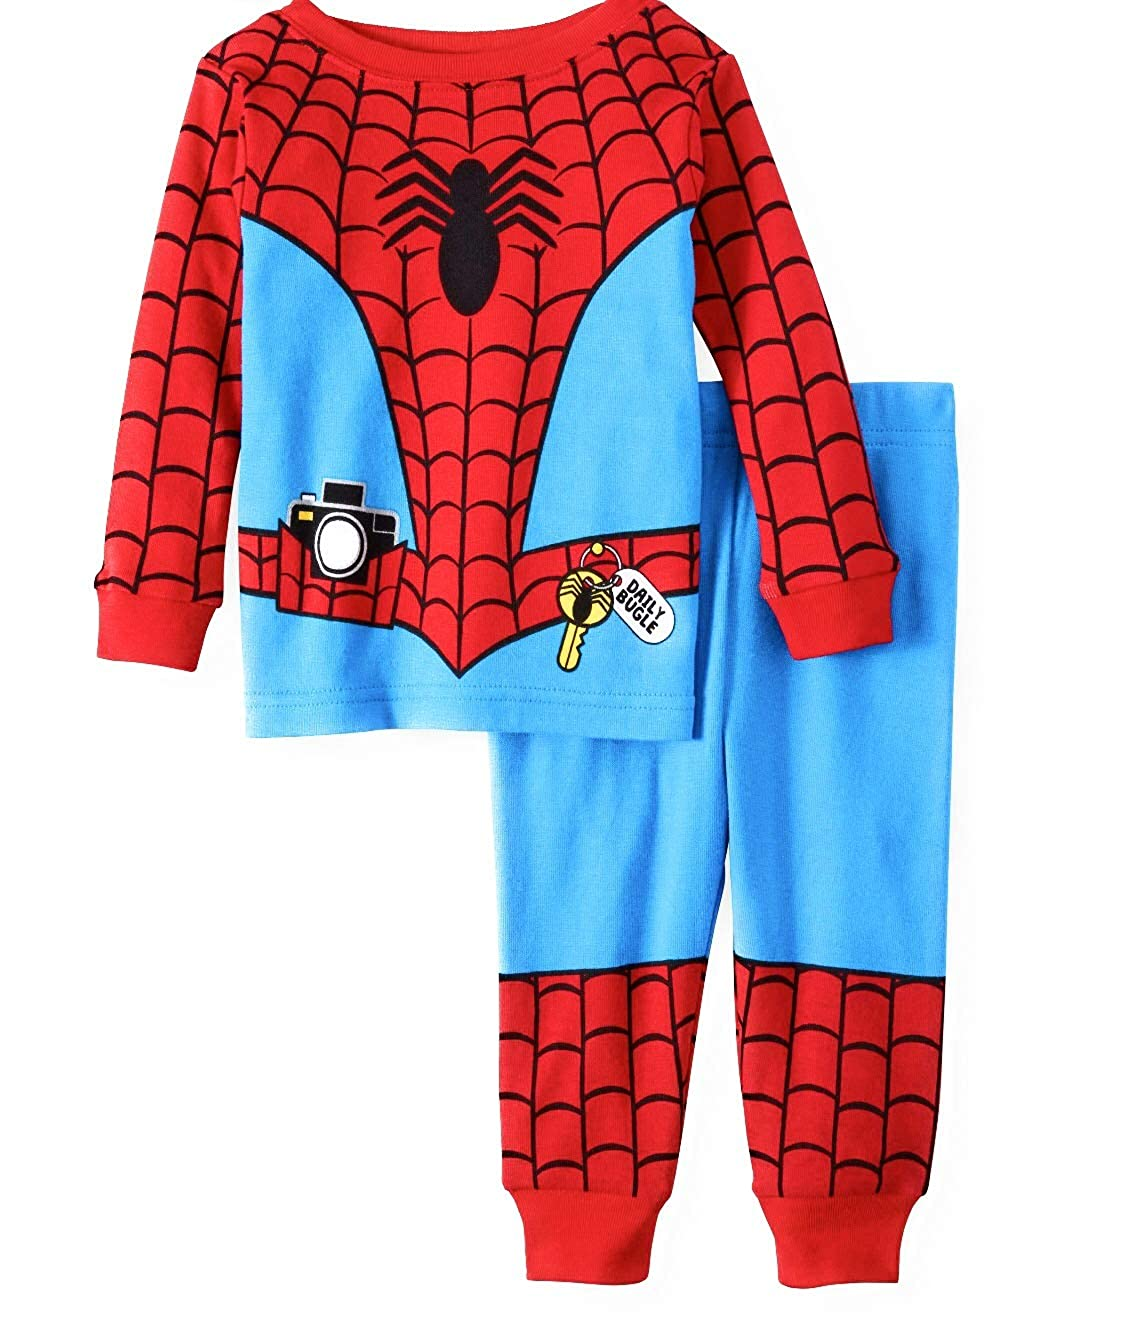 Spiderman Baby Boy Pajamas Tight Fit